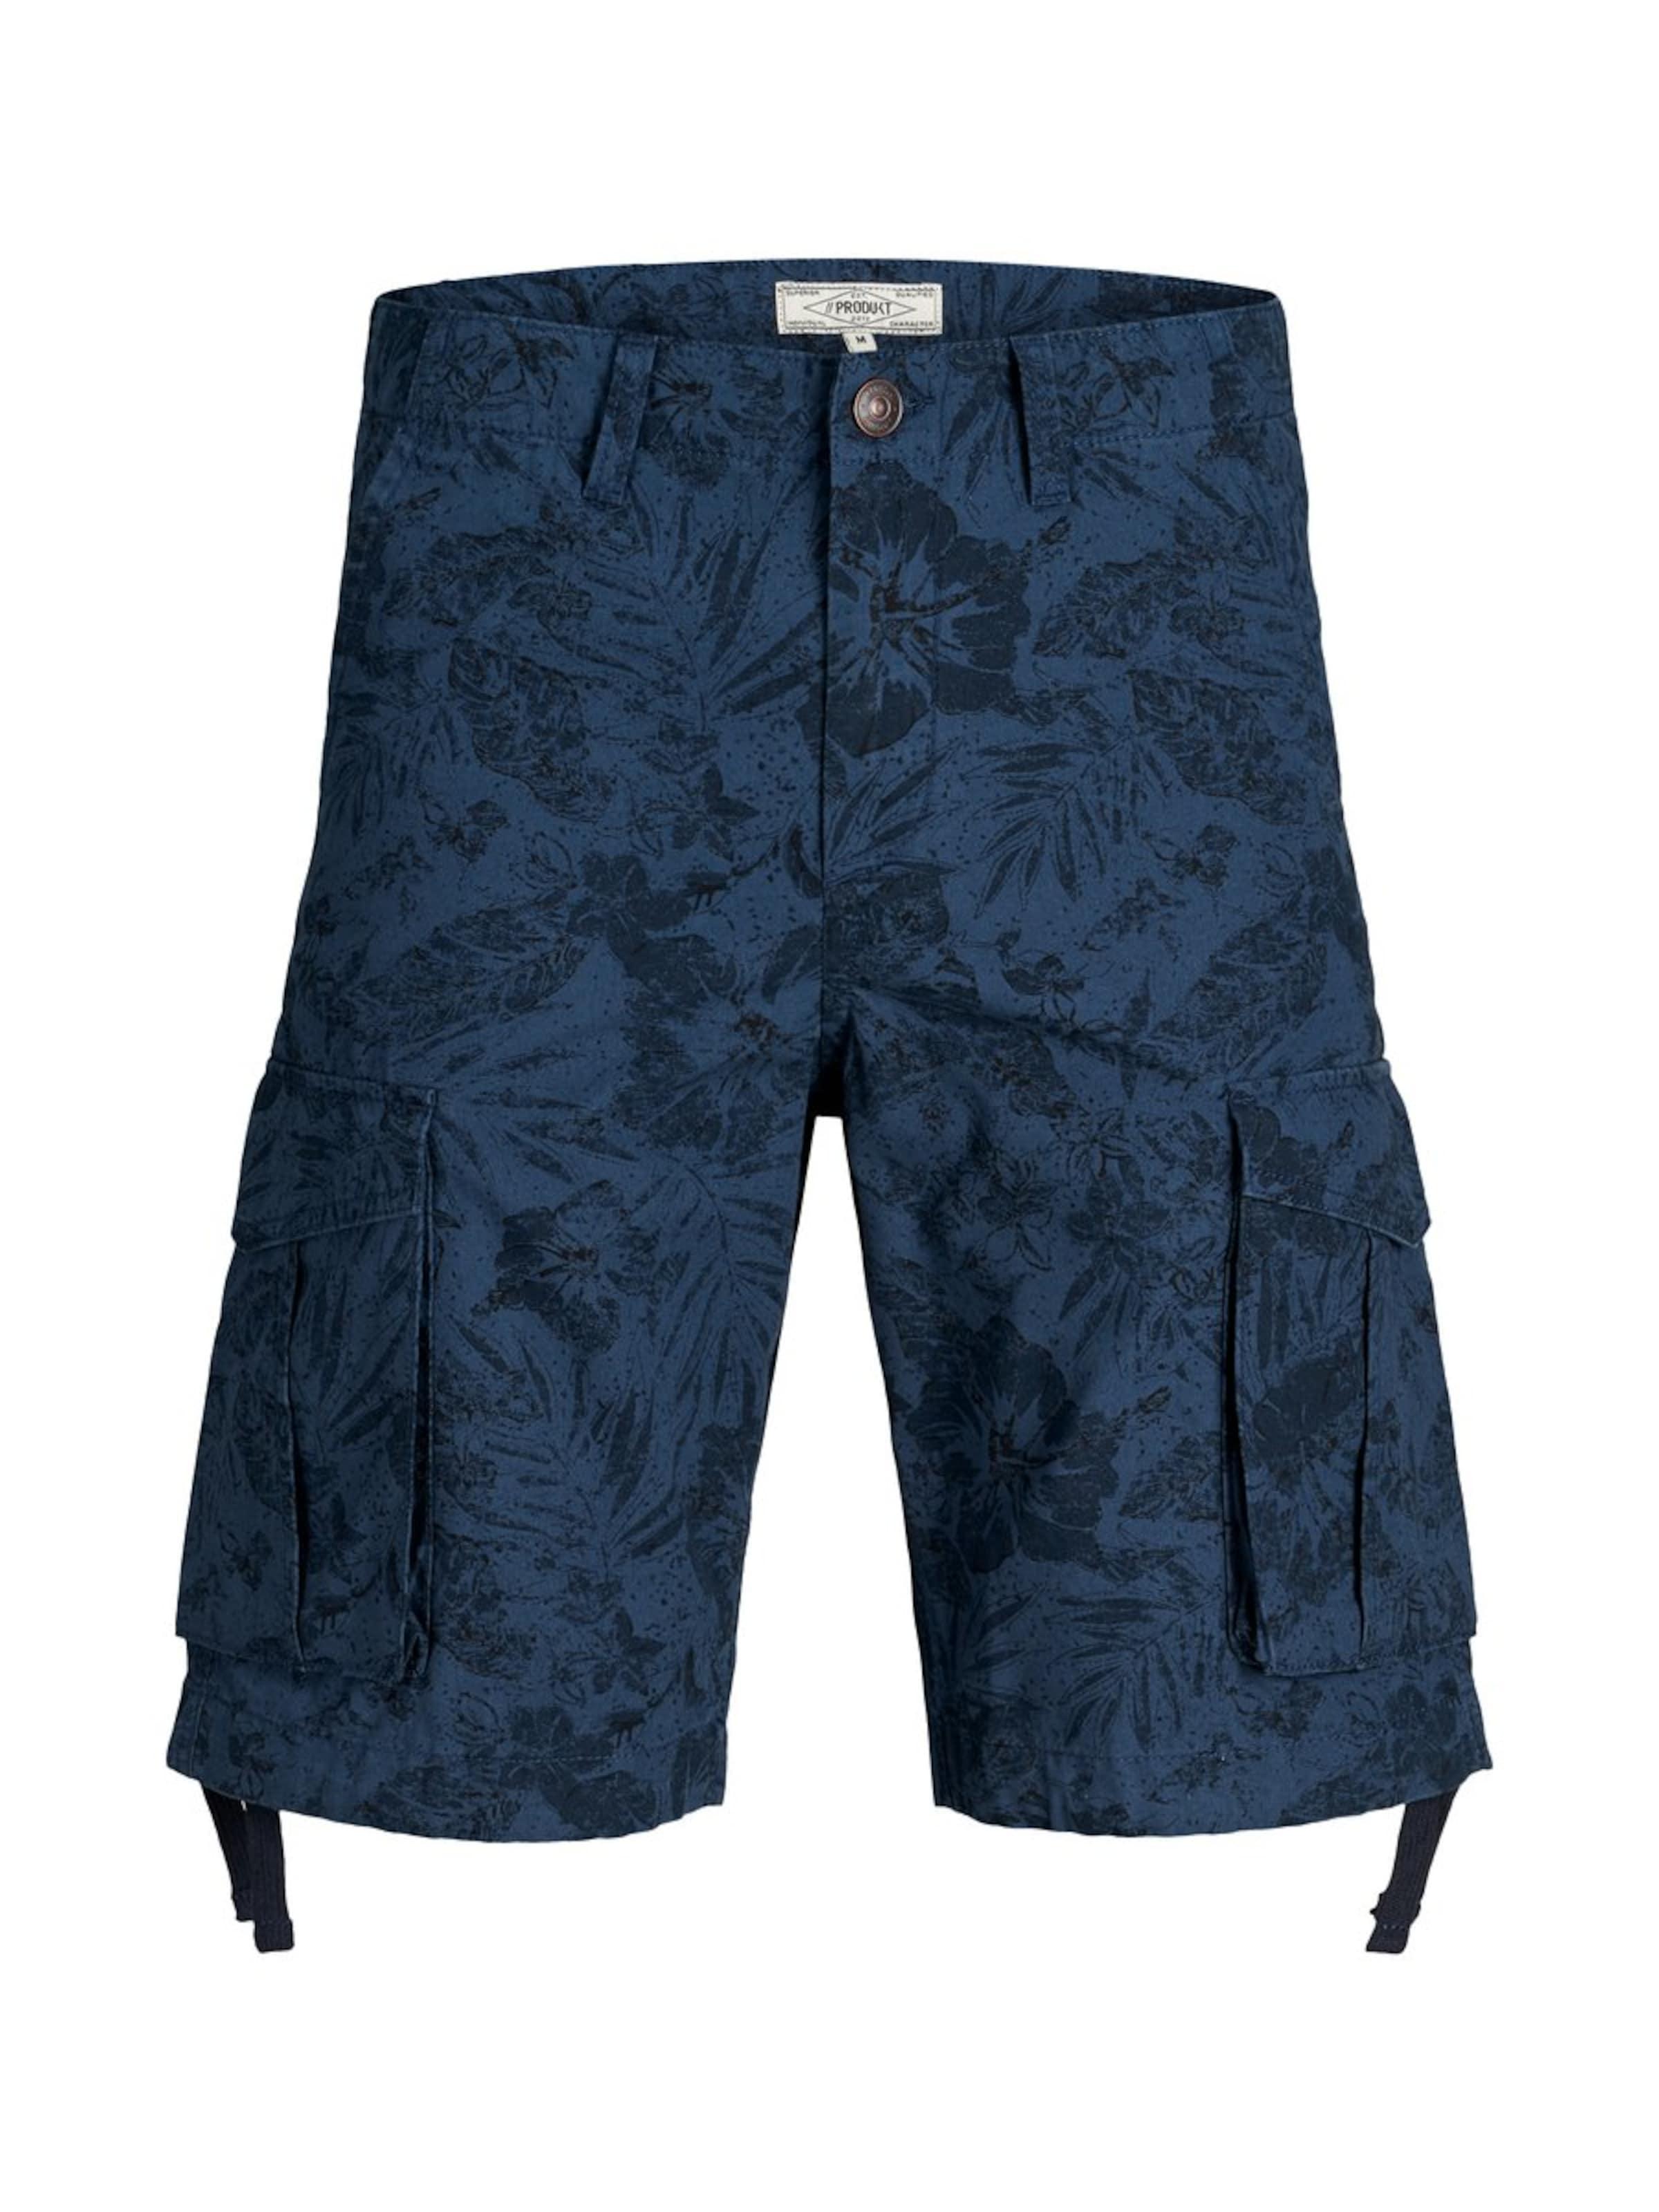 Produkt Shorts Dunkelblau In Produkt Shorts In yYbf6g7